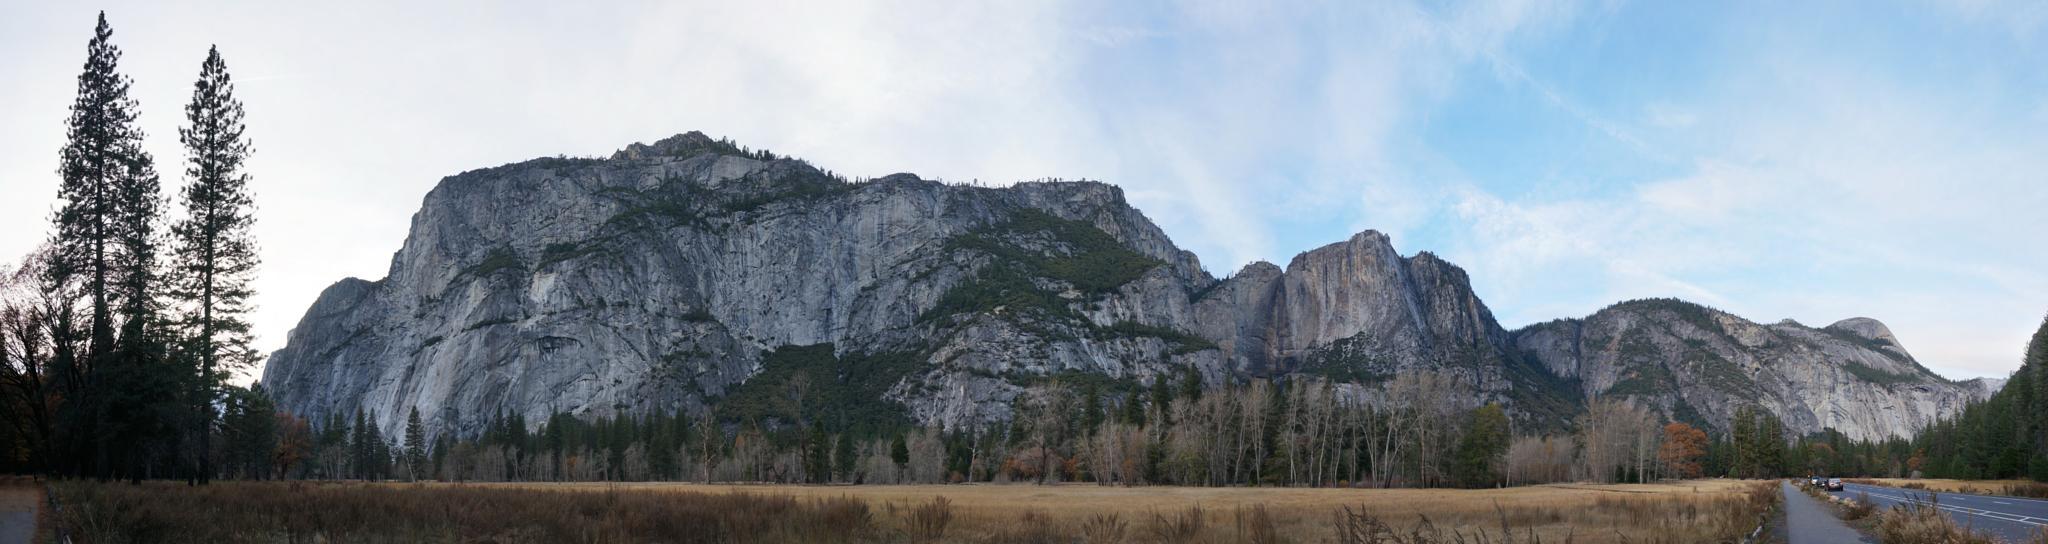 Yosemite Mountains by Flogger